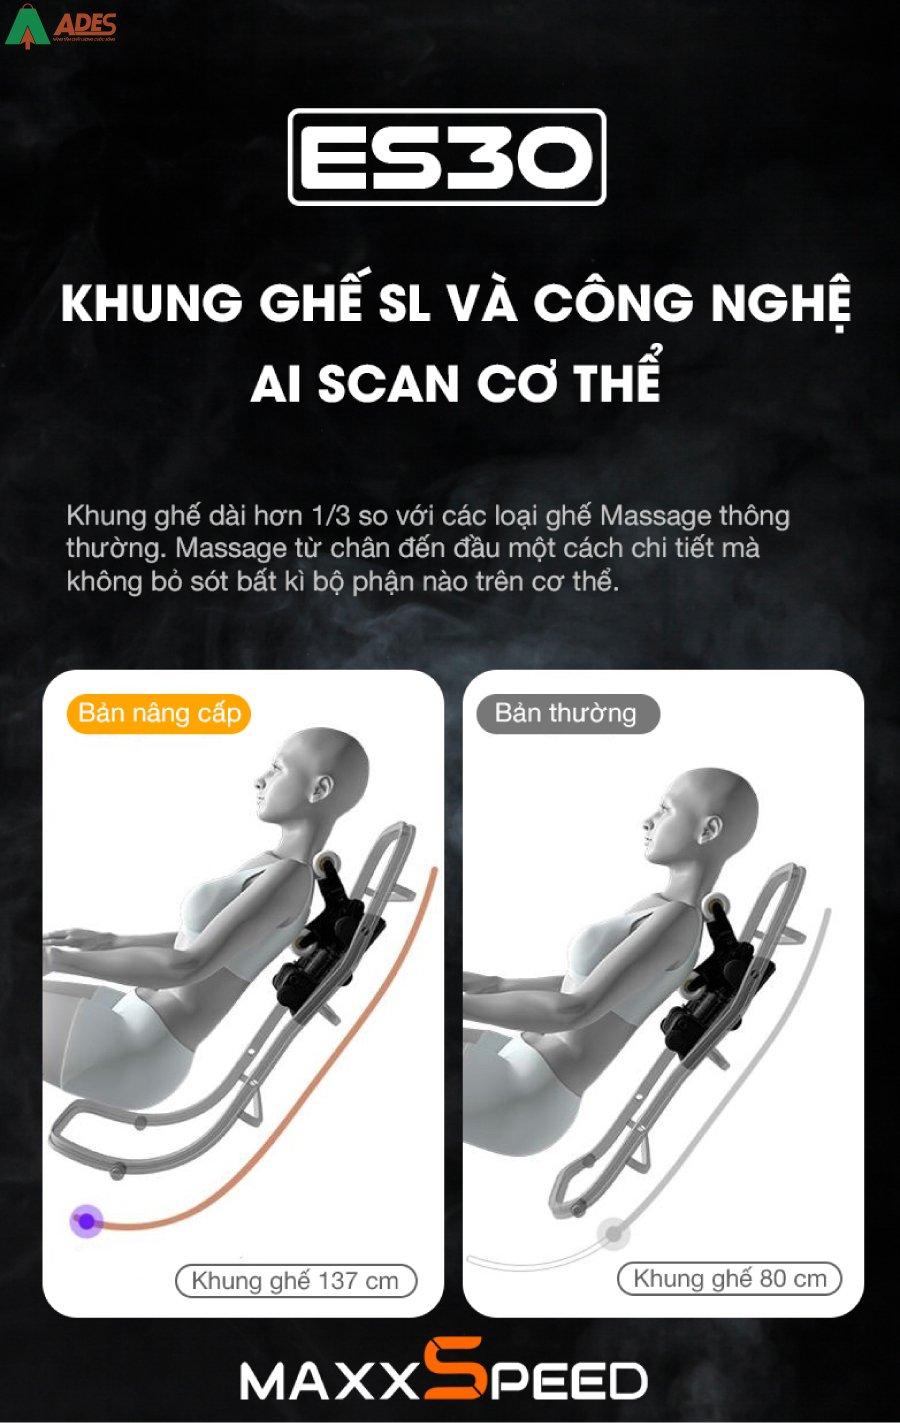 Ghe Massage Azaki Maxxspeed ES30 chat luong